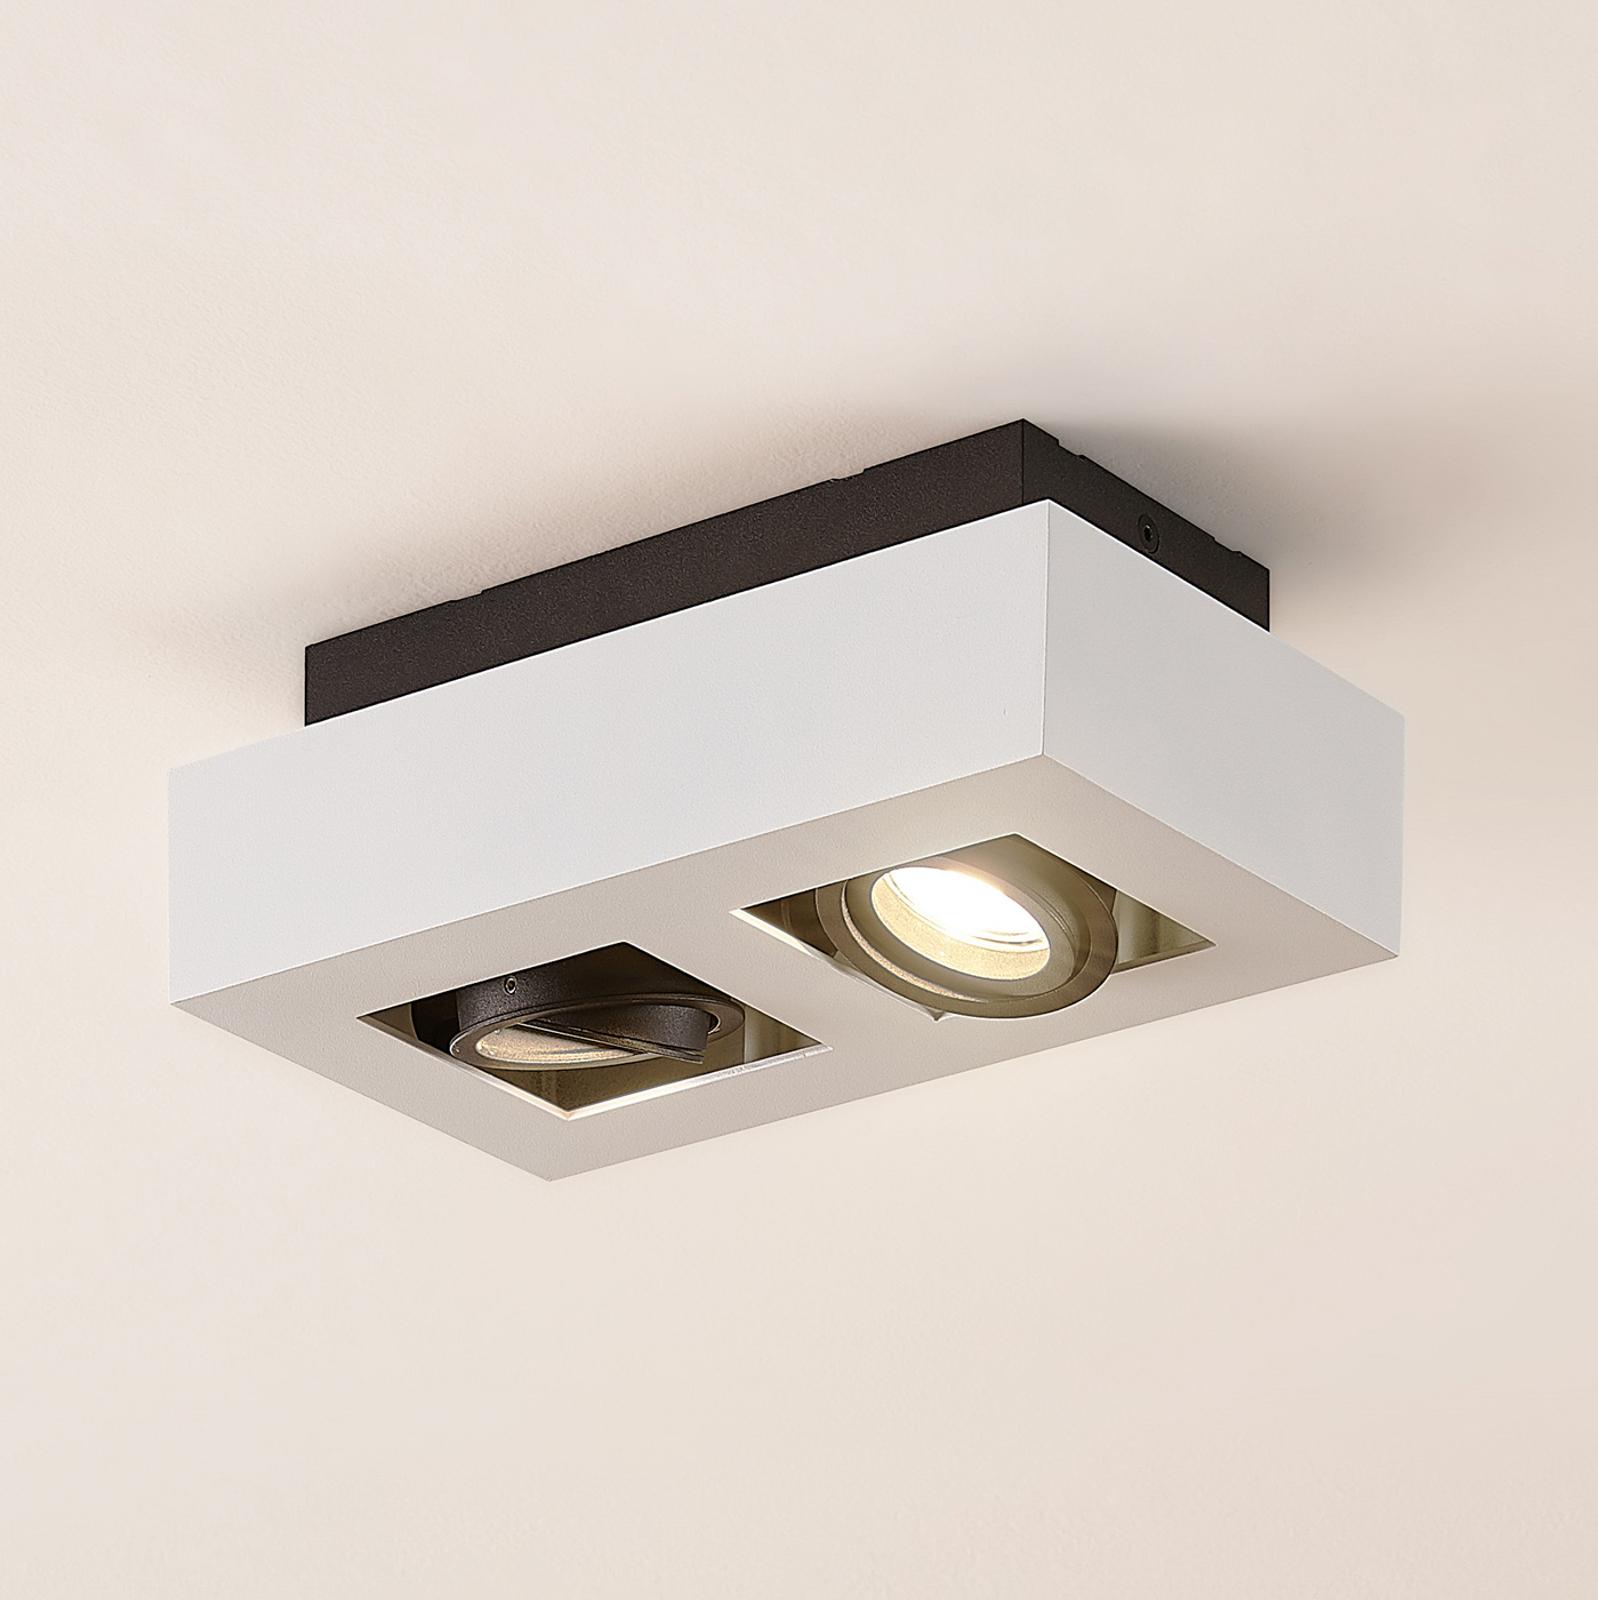 Arcchio Vince lámpara de techo, 25x14cm blanco